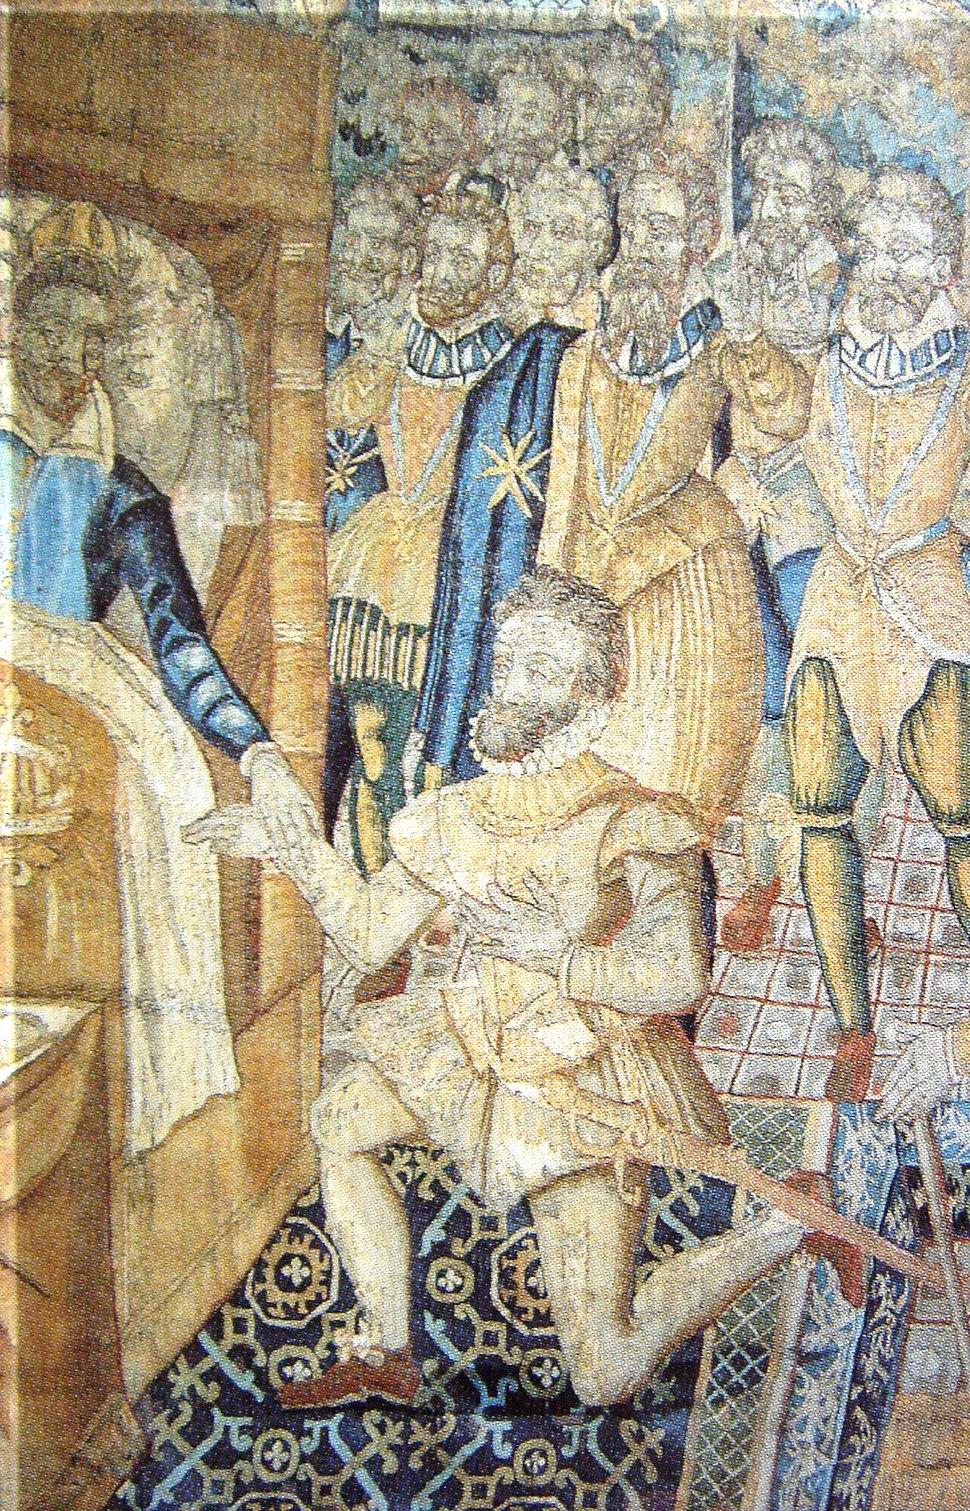 Henry III on his deathbed designating Henri de Navarre as his successor